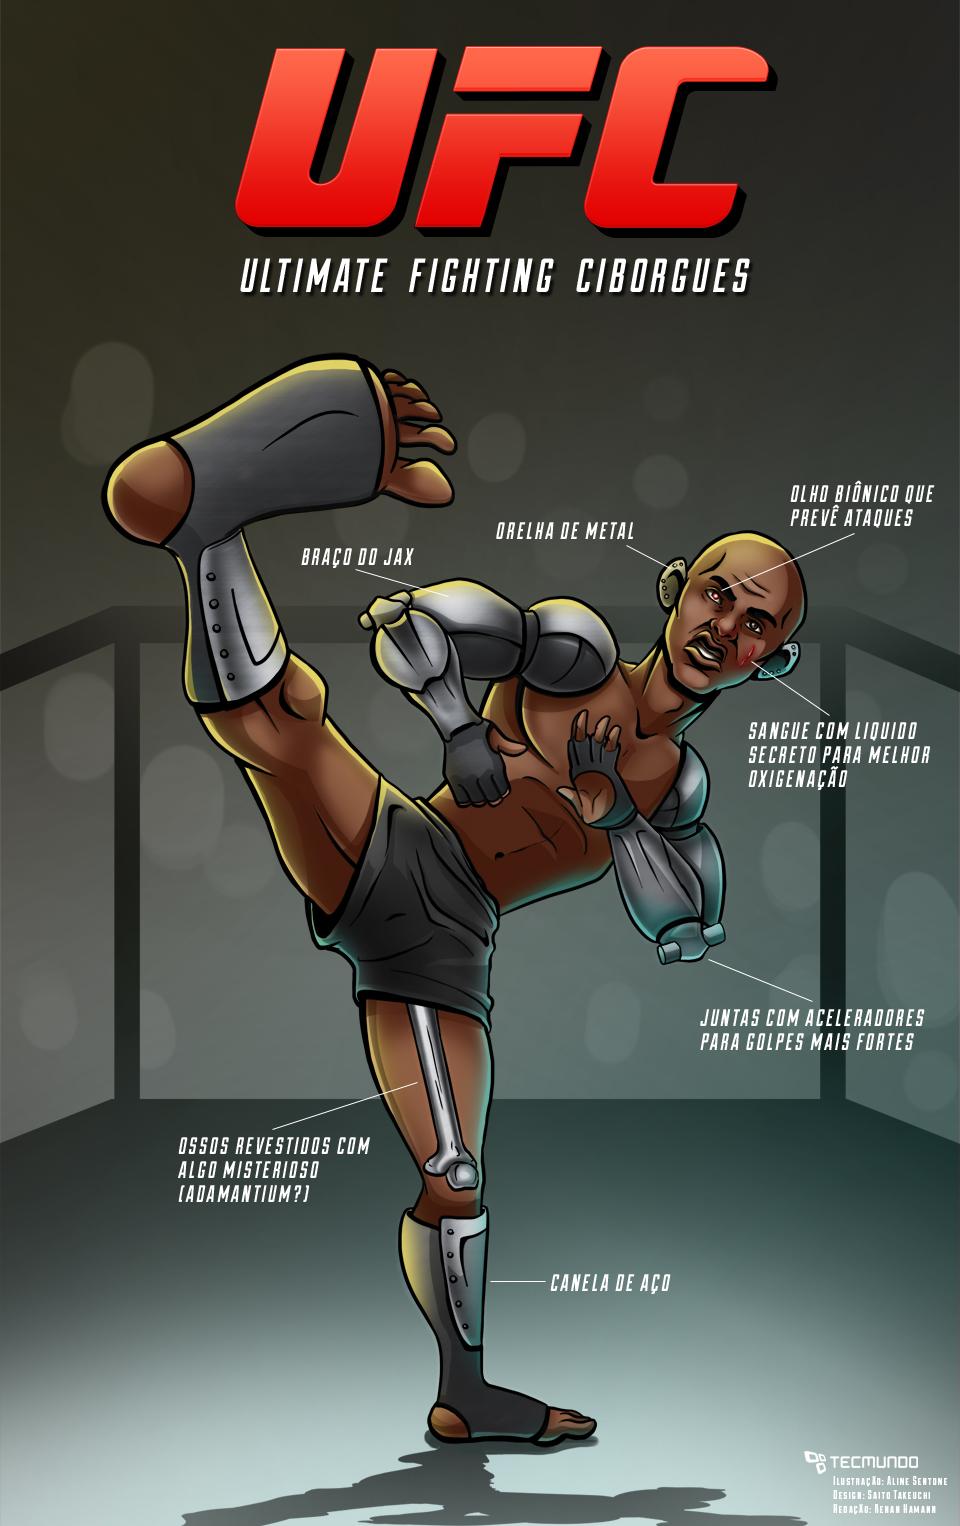 Erro 404: Ultimate Fighting Ciborgues [ilustração]